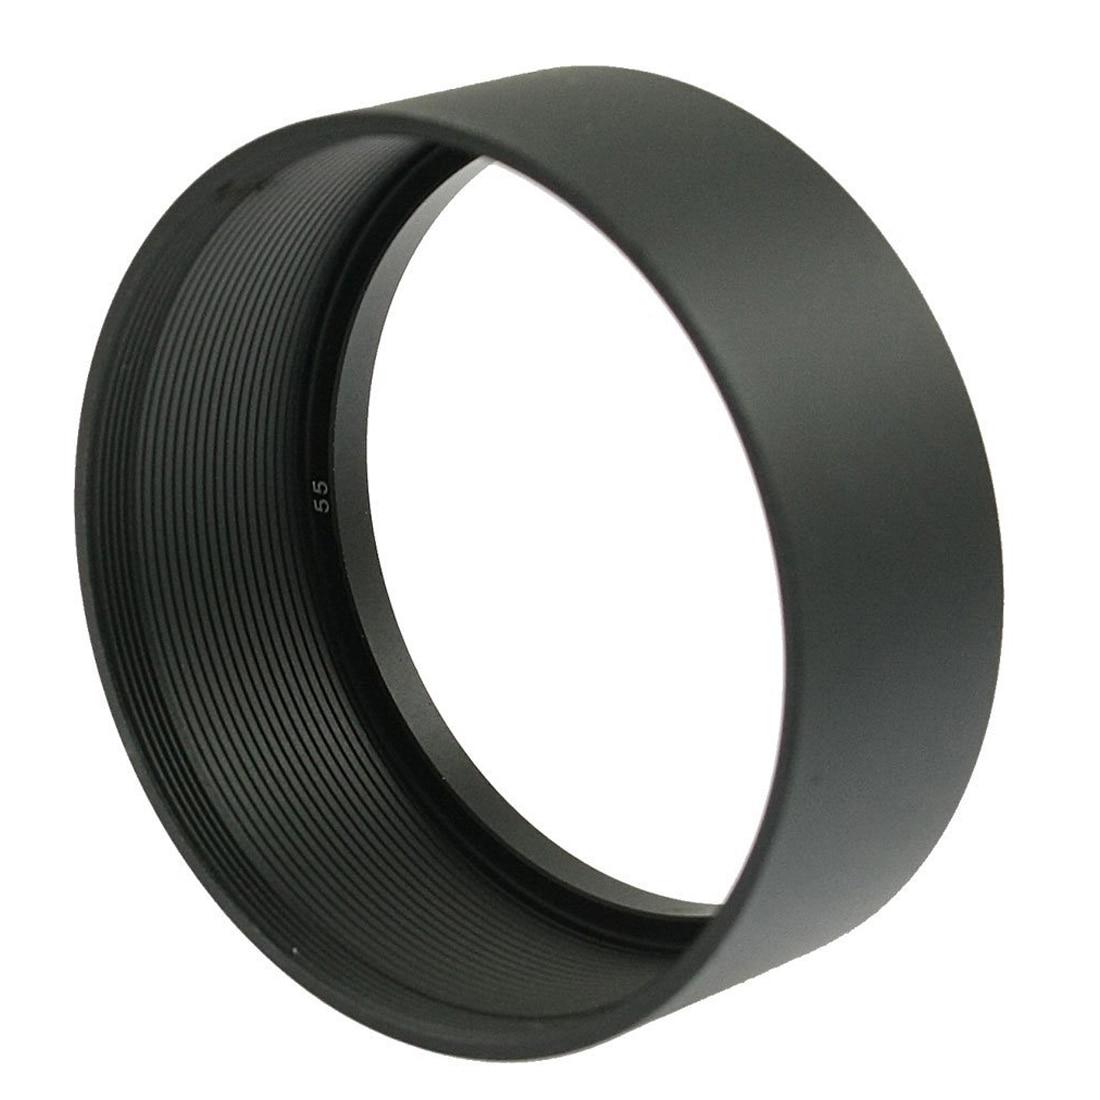 EDT-Замена Винт на Горе 55 мм Камеры Металл Бленда Черный